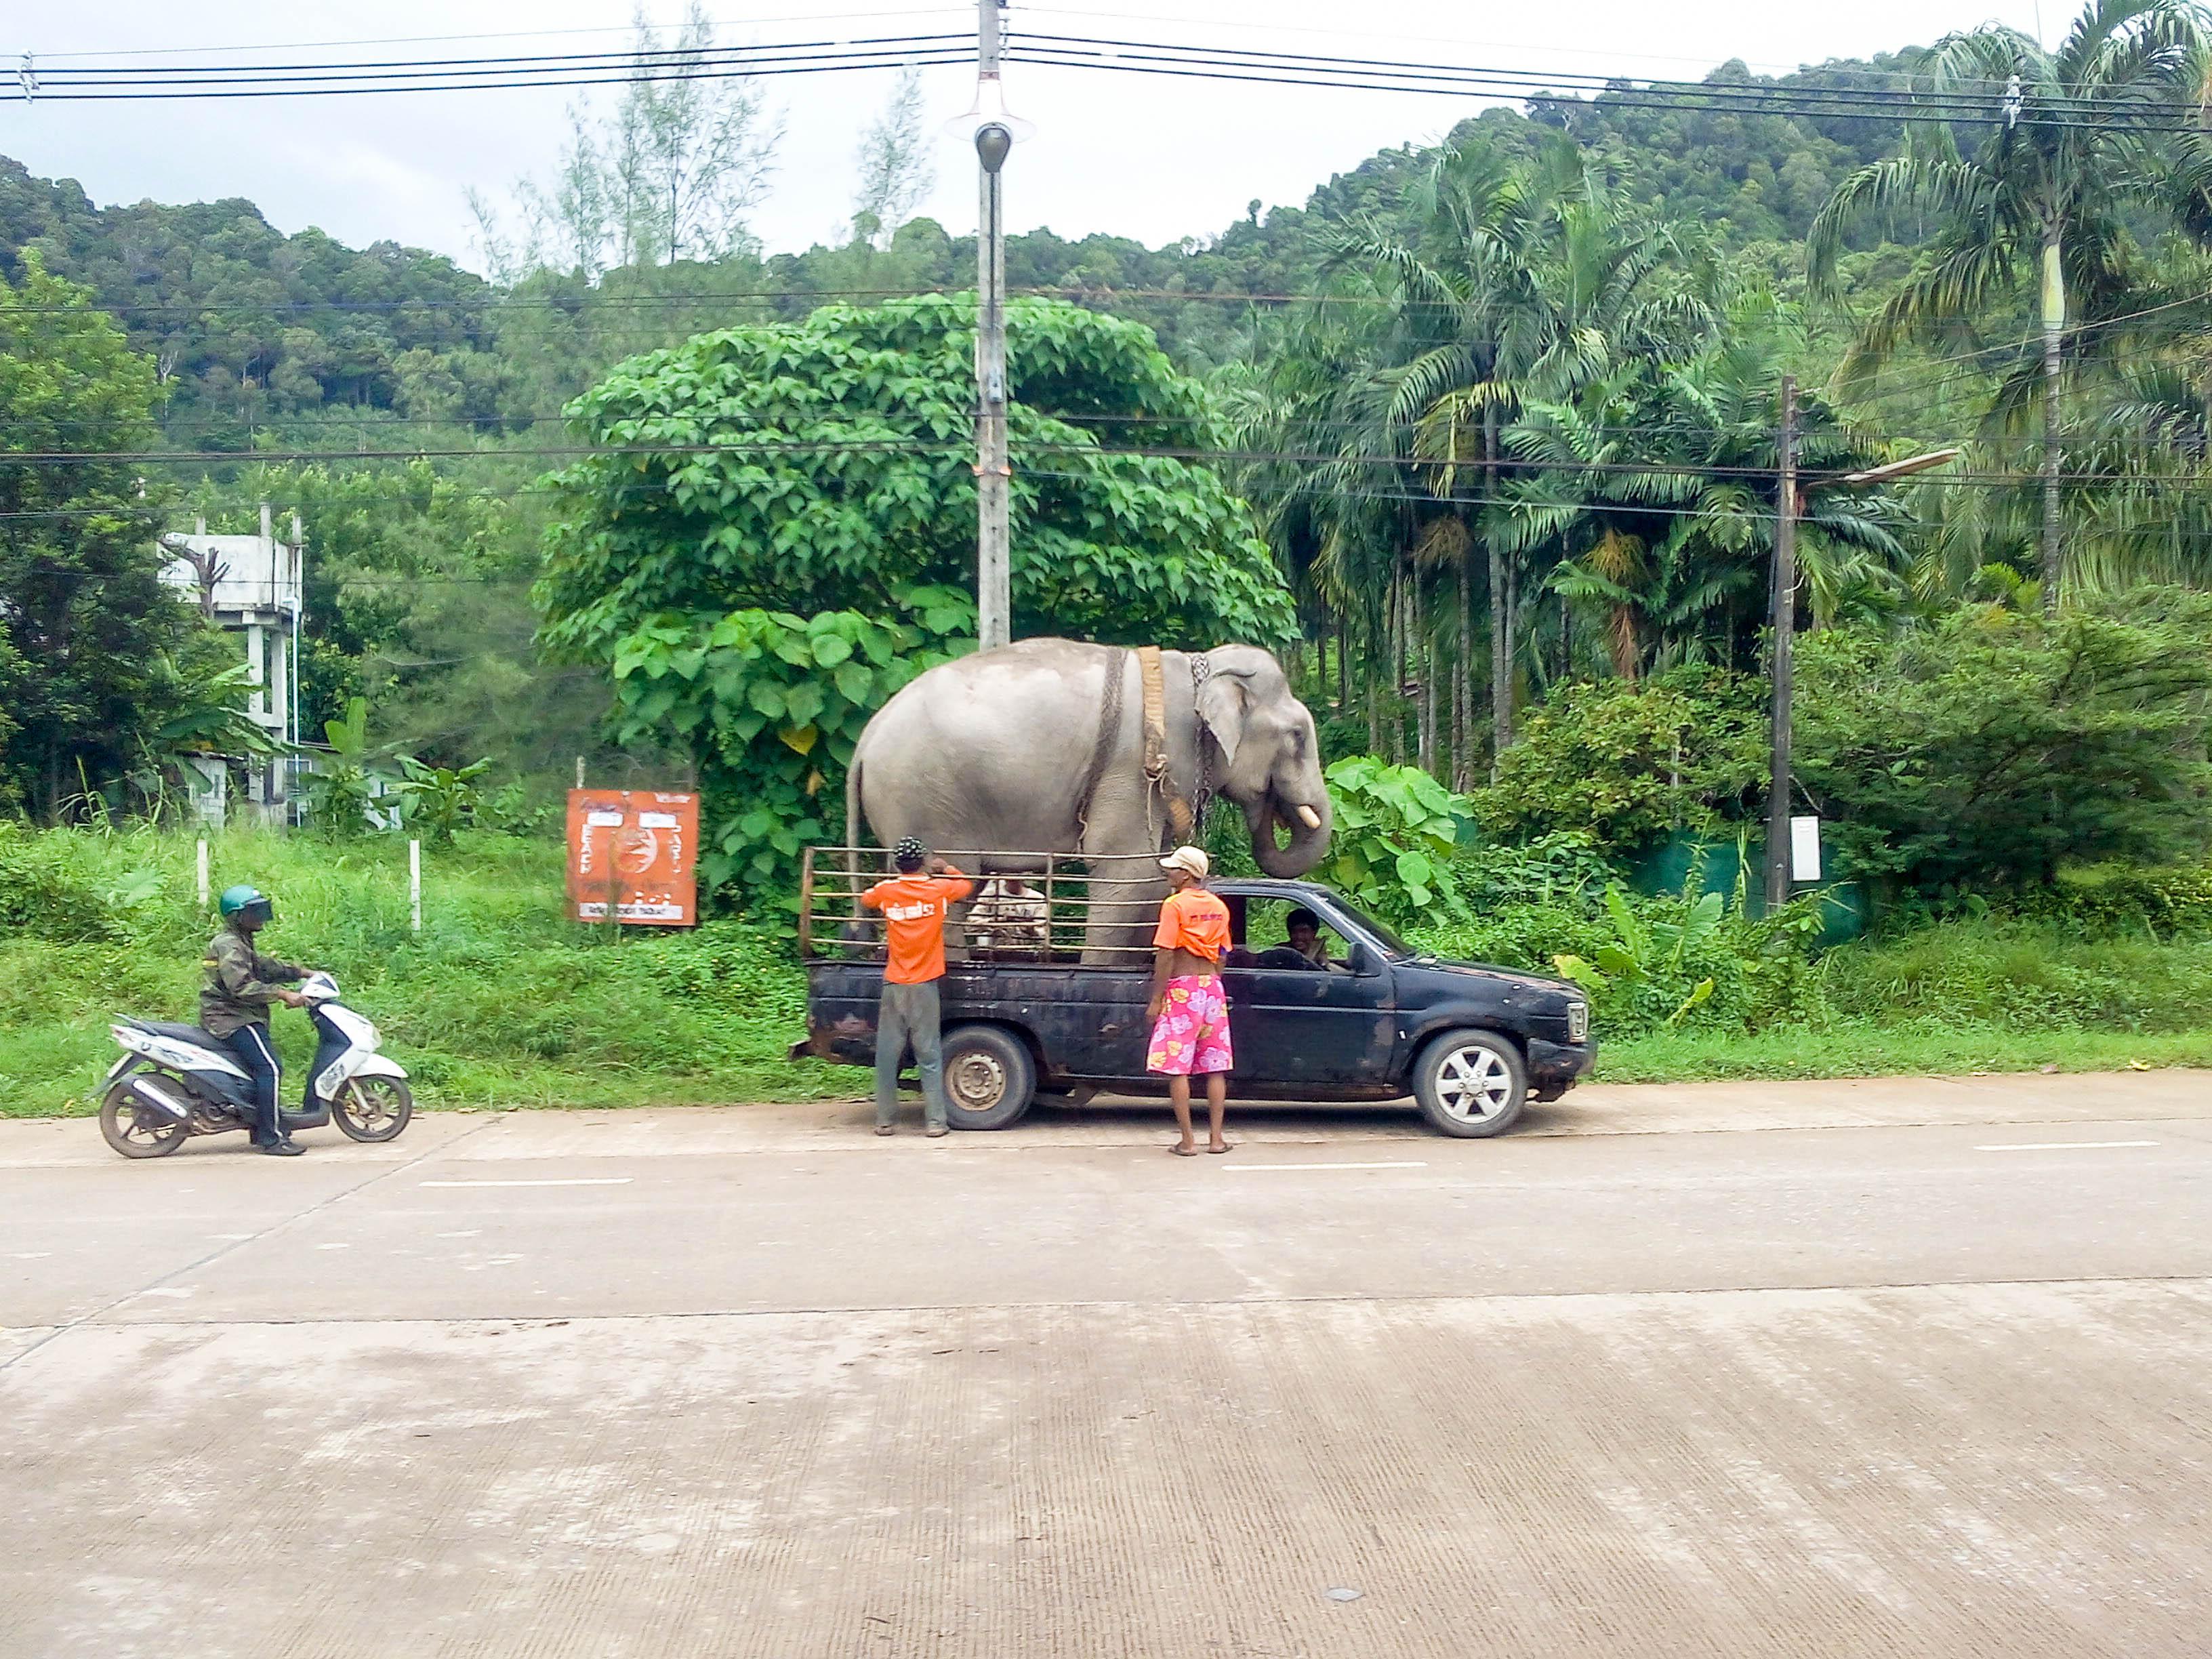 éléphant à Koh Lanta, Thaïlande